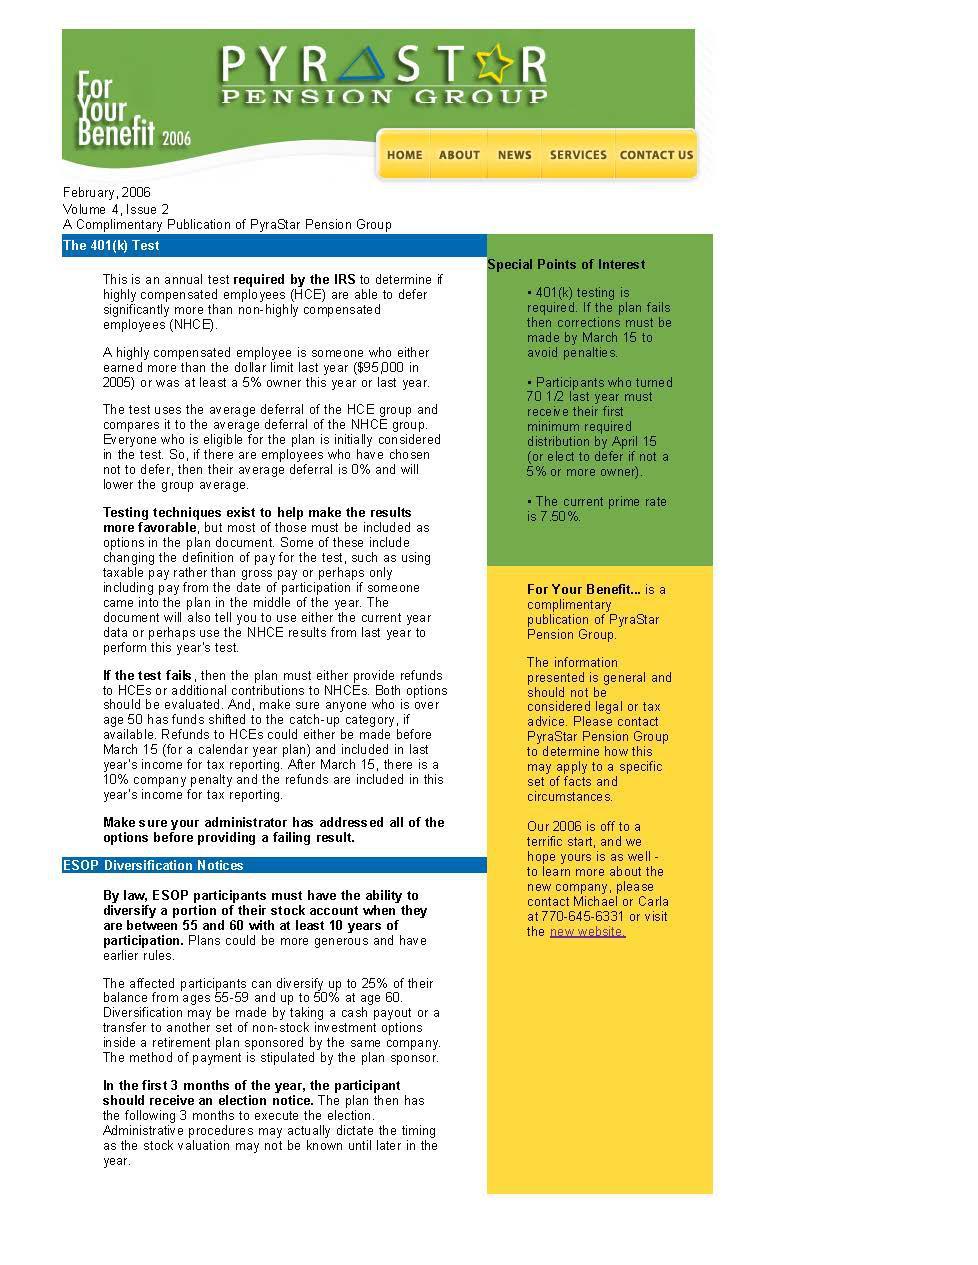 ESOP Diversification Notices